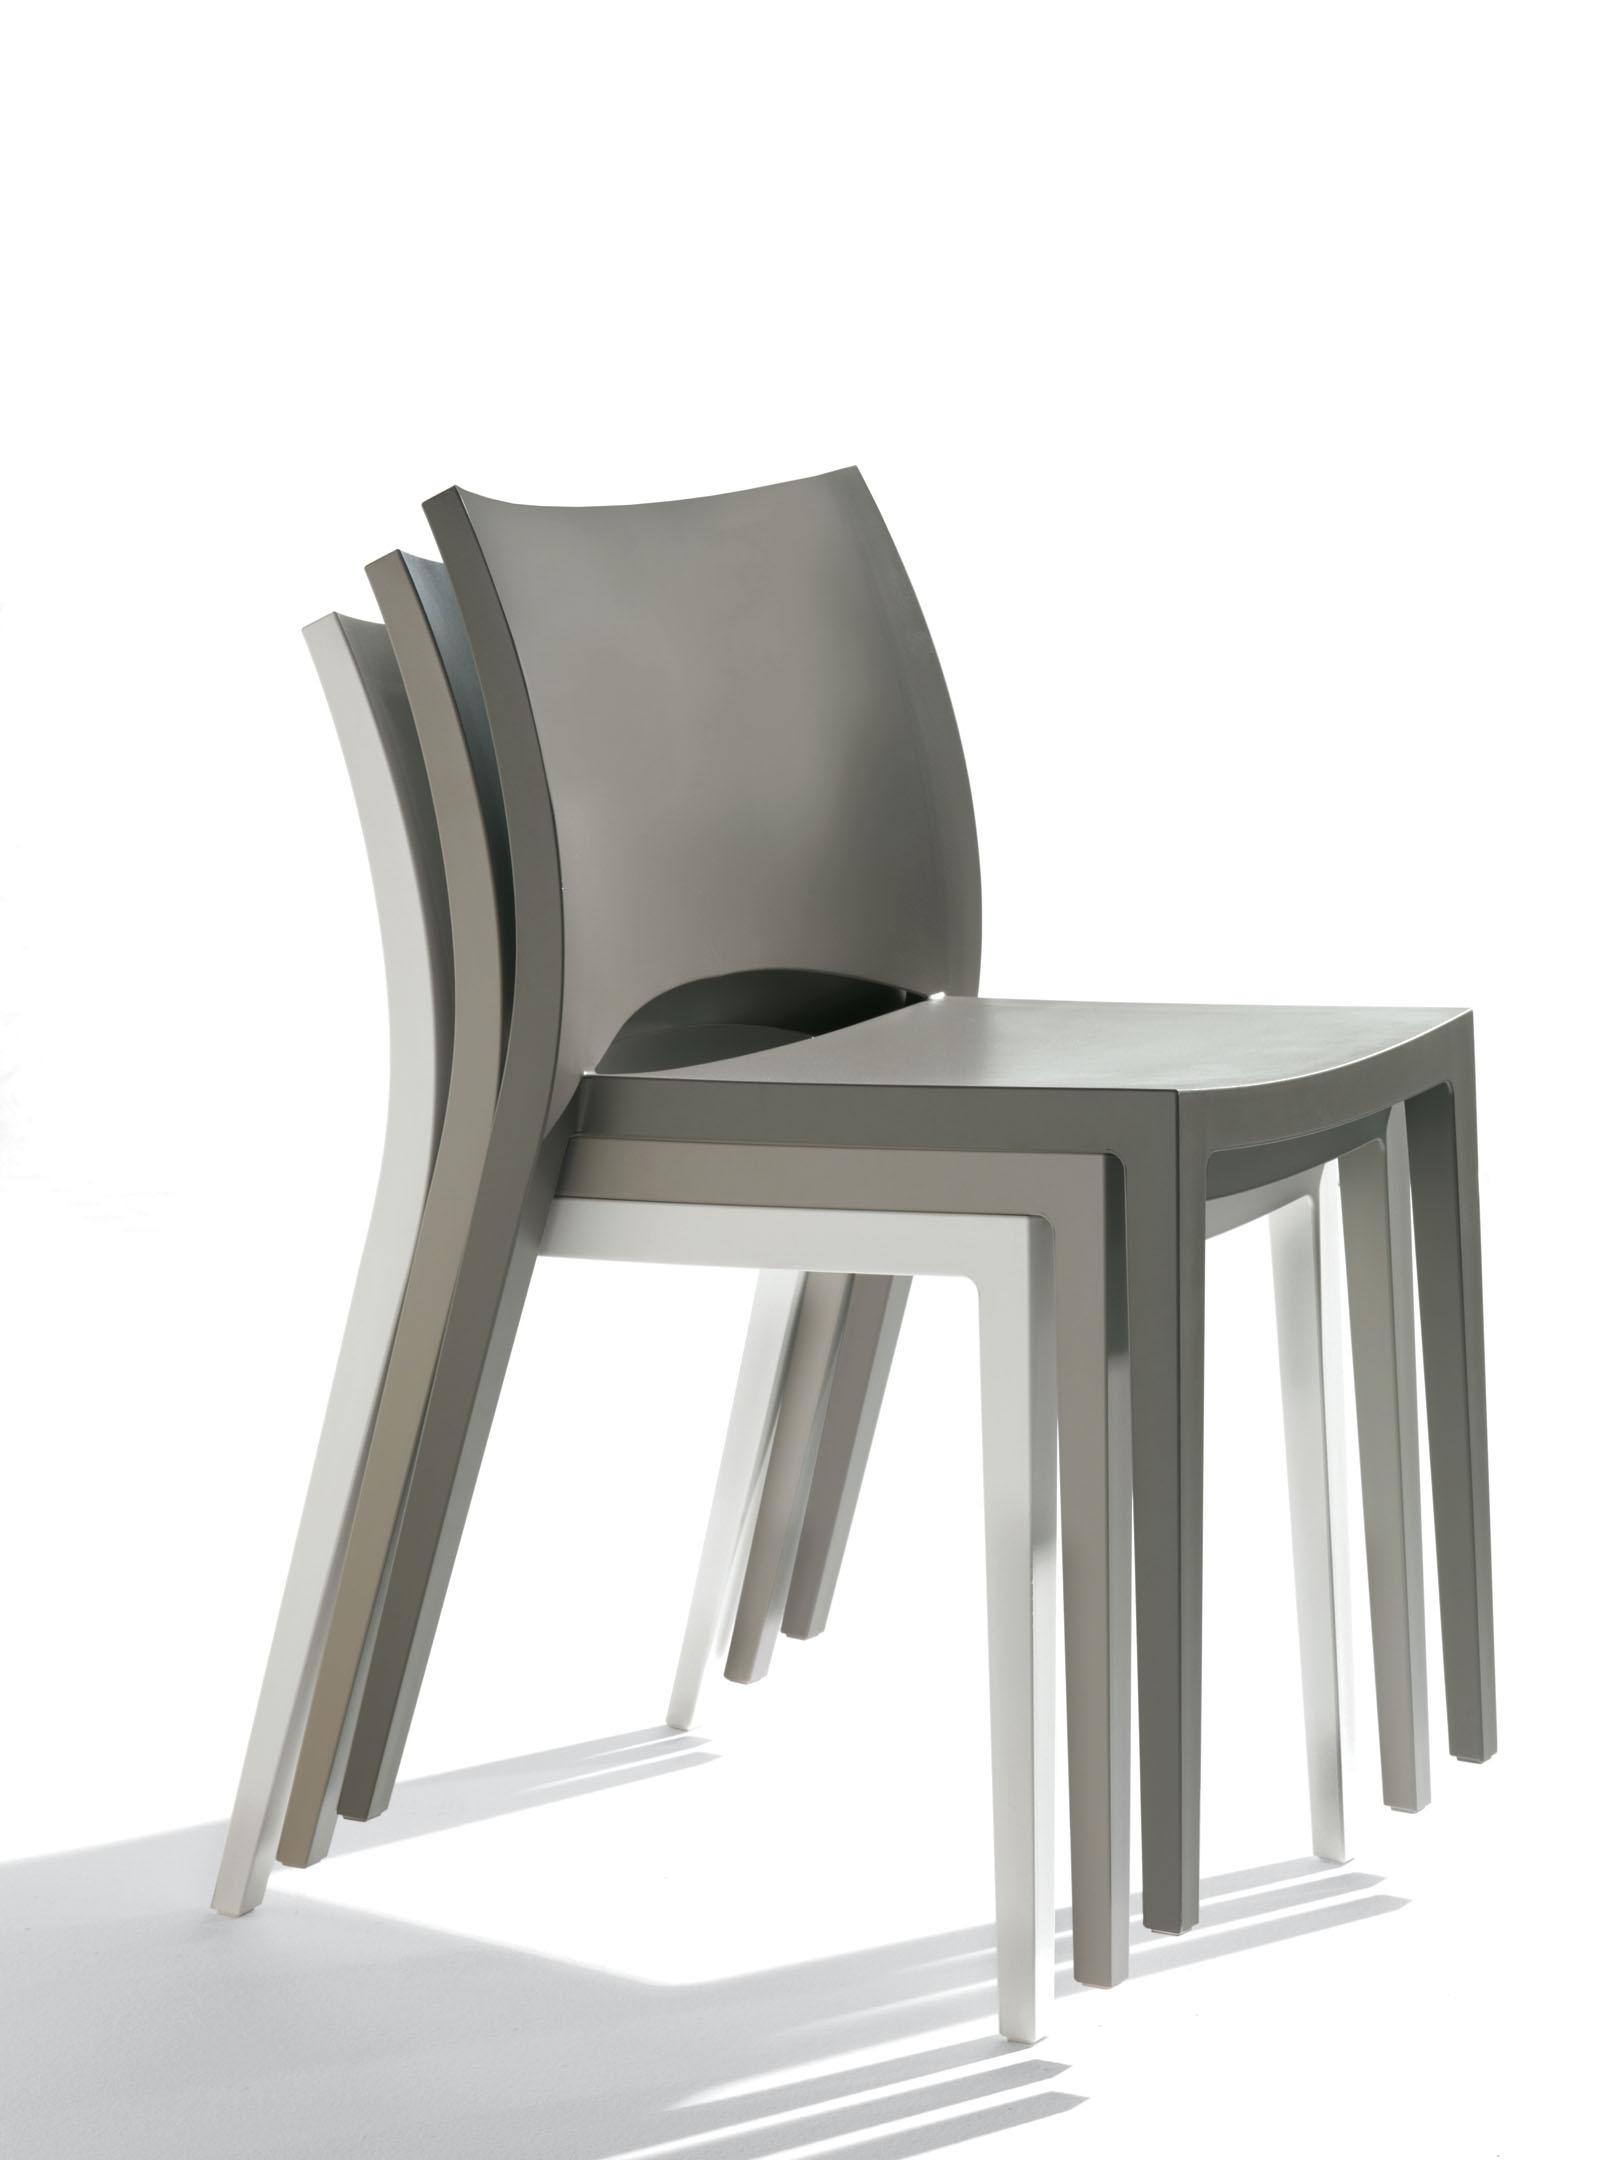 Sedie bontempi in offerta sedie a prezzi scontati for Sedie prezzi